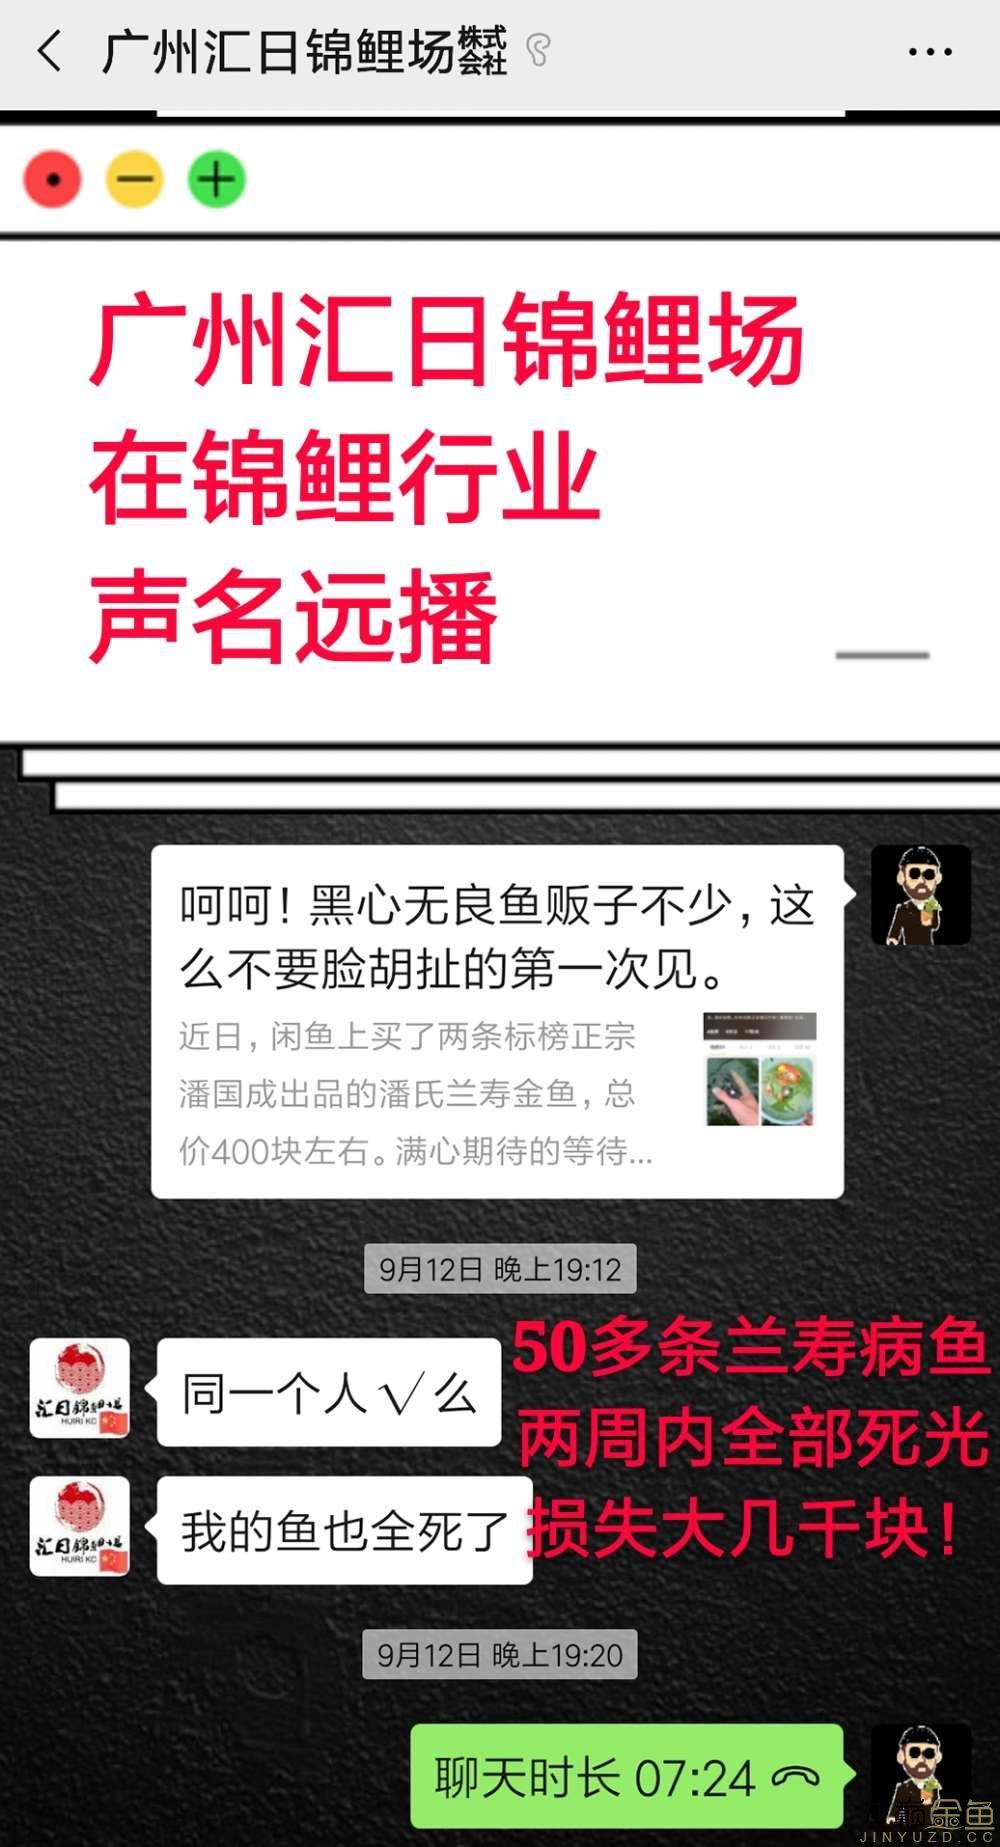 Screenshot_2019-09-24-21-08-29-934_com.tencent.mm.jpg